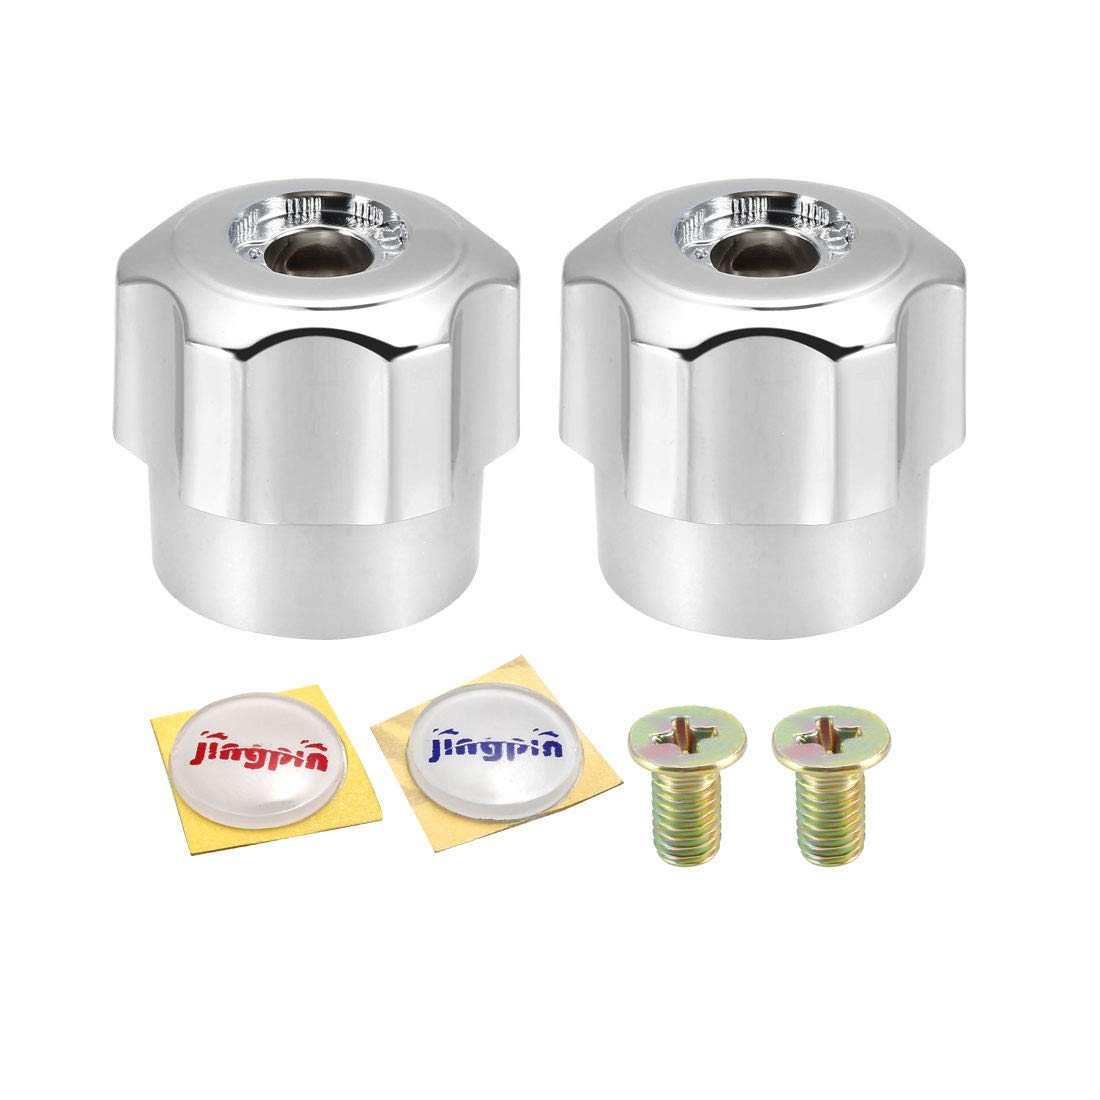 sourcing map Faucet Knob Handle 30mm Dia Universal Faucet Replacement Knob Silver Tone 2 Pcs